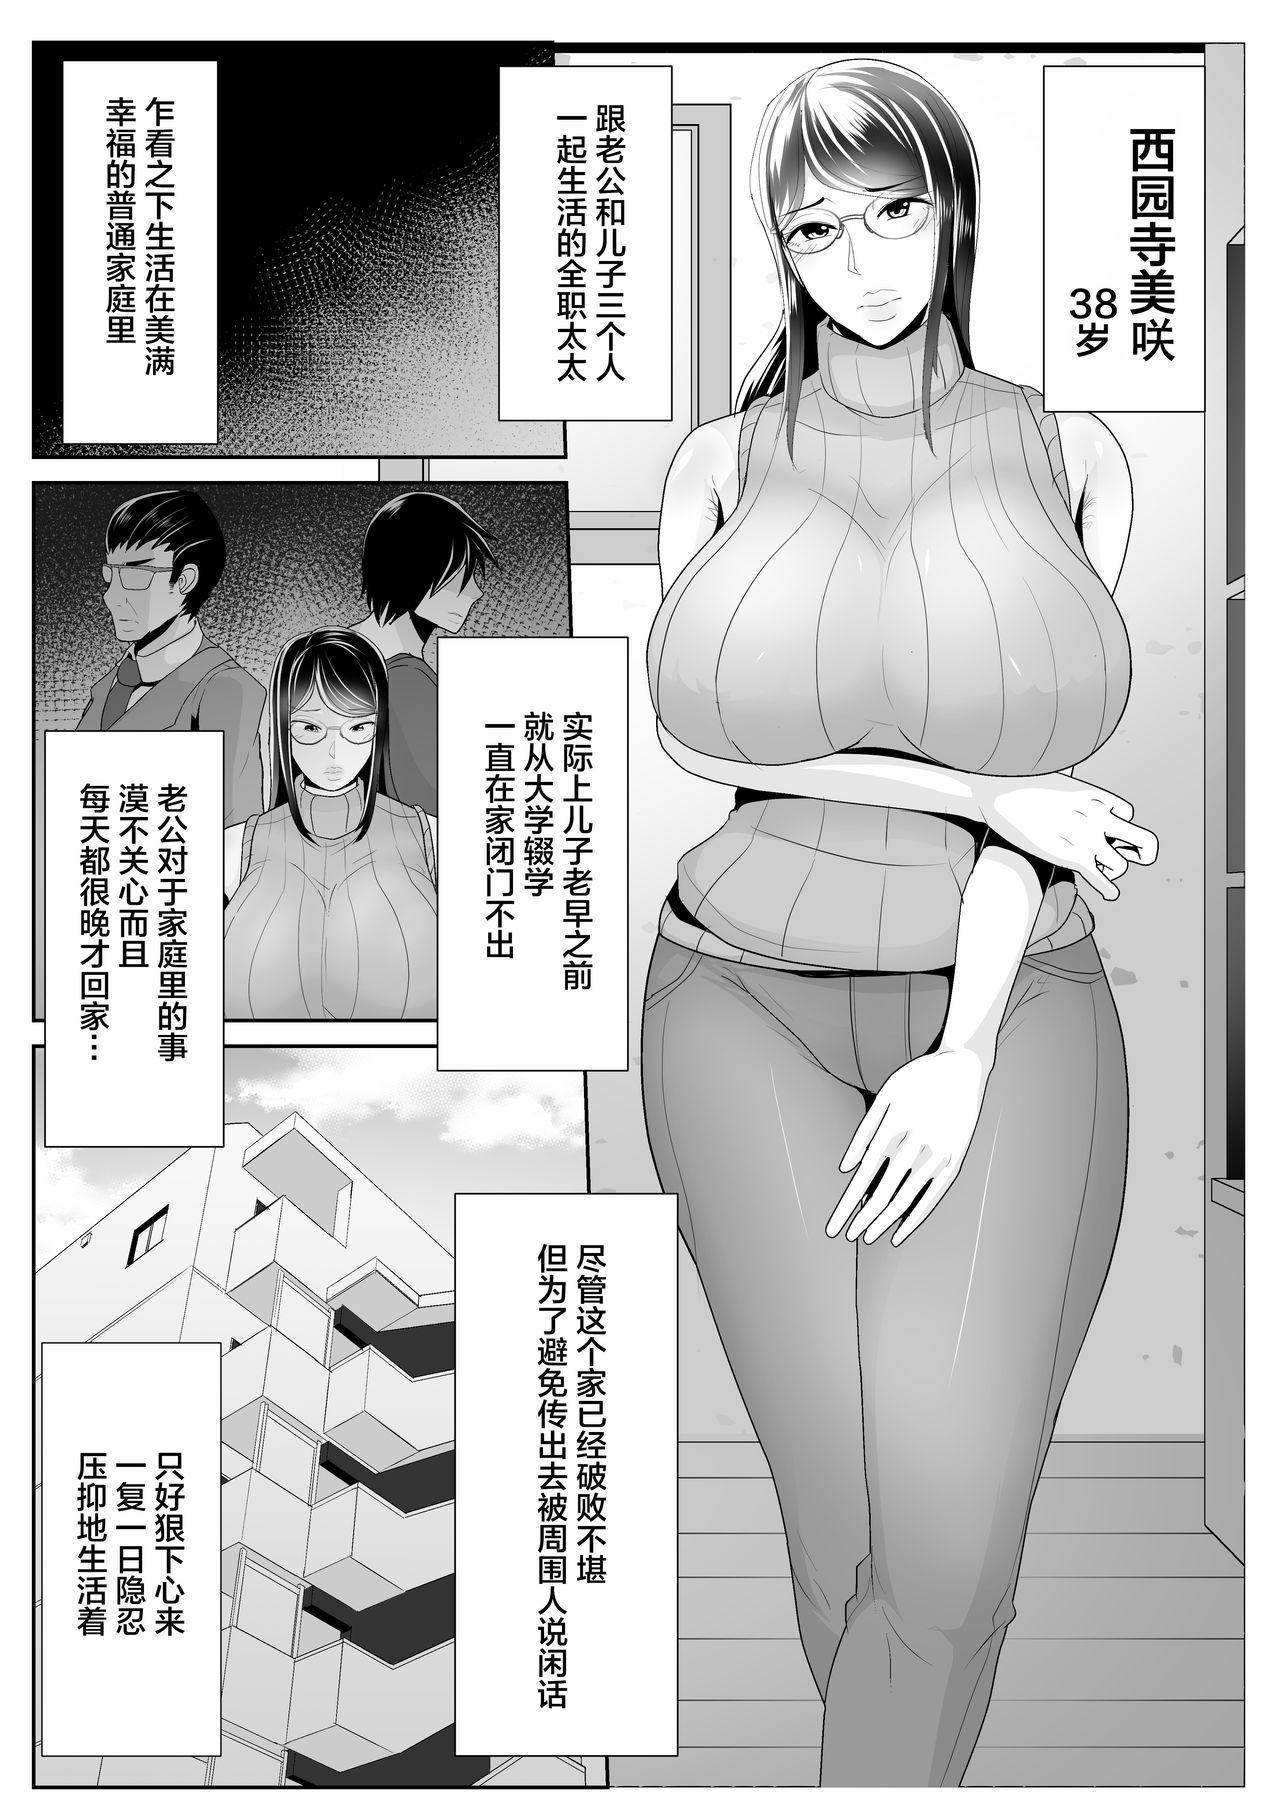 [Akikan] Kaa-san Senyou Saimin Appli[Chinese]【不可视汉化】 2